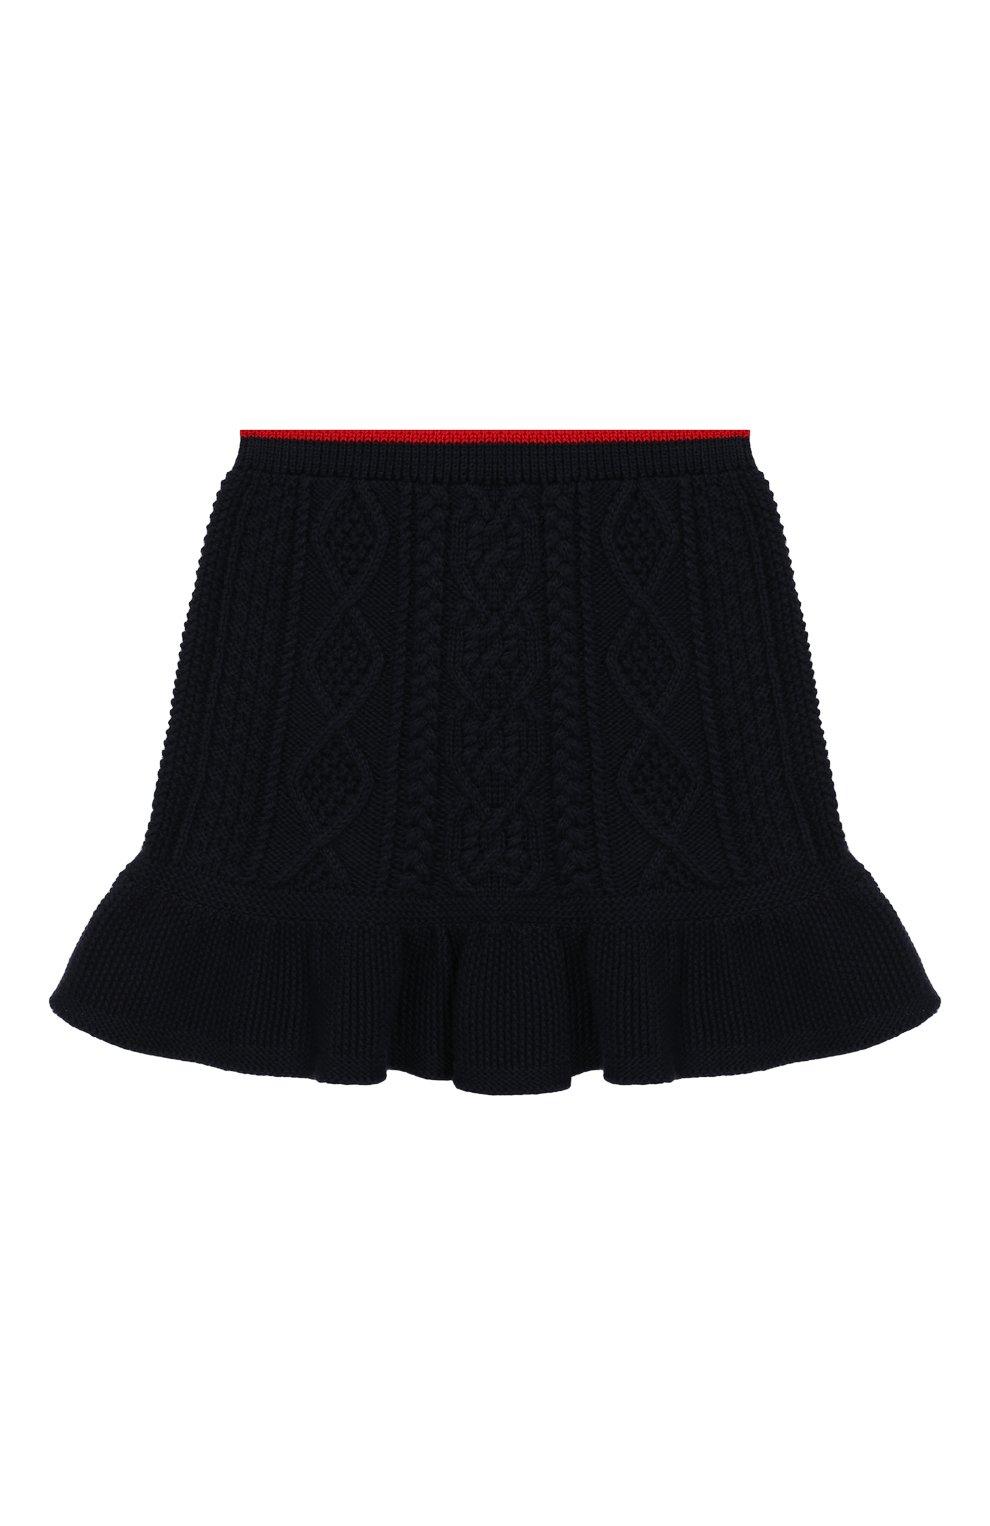 Детский комплект из юбки и топа POLO RALPH LAUREN синего цвета, арт. 311736827 | Фото 4